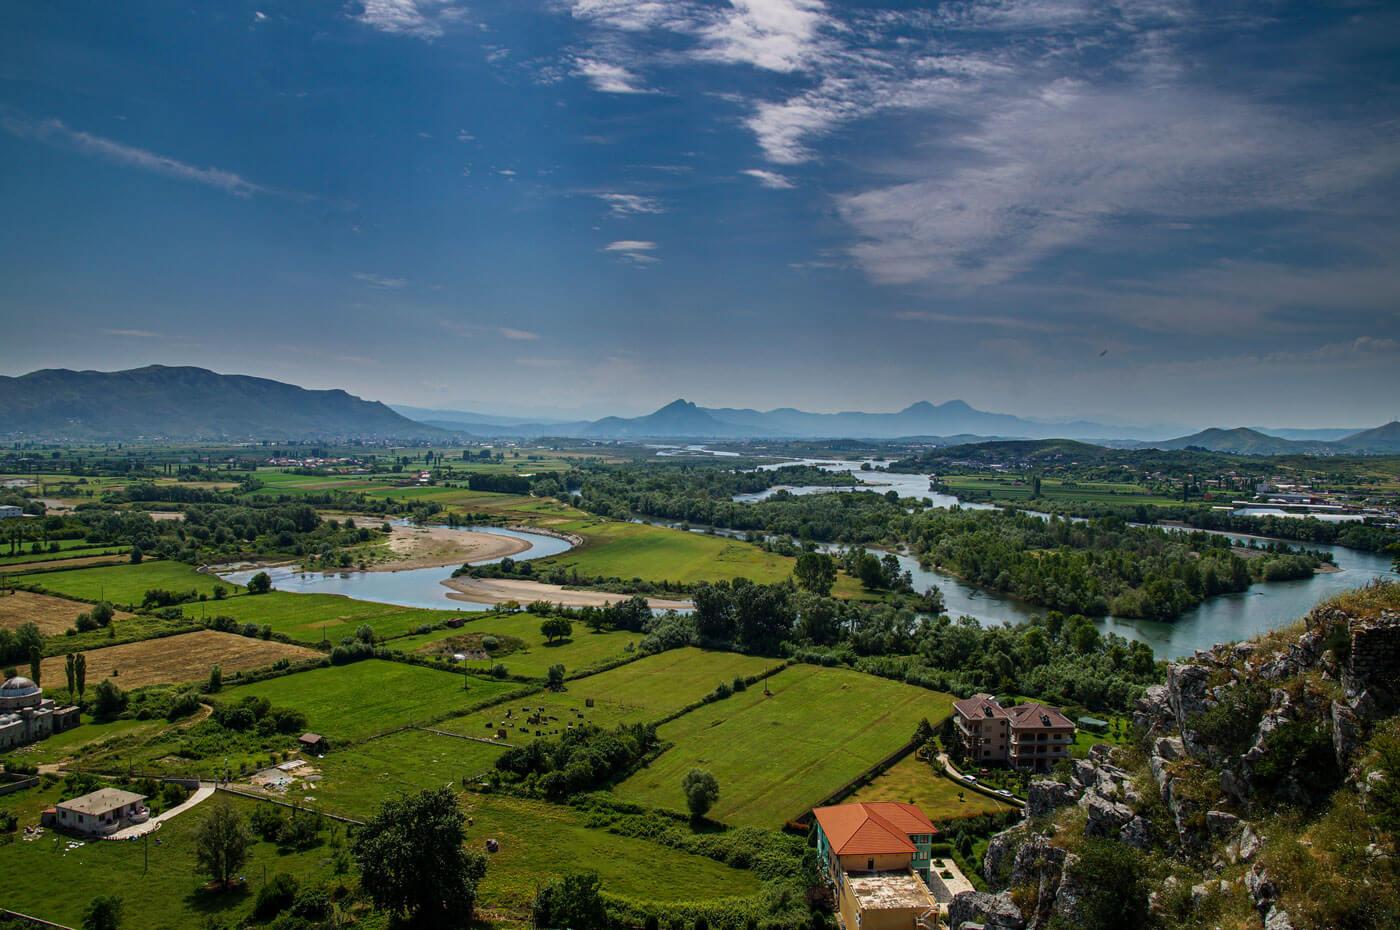 shkoder-buna-rivier-1400